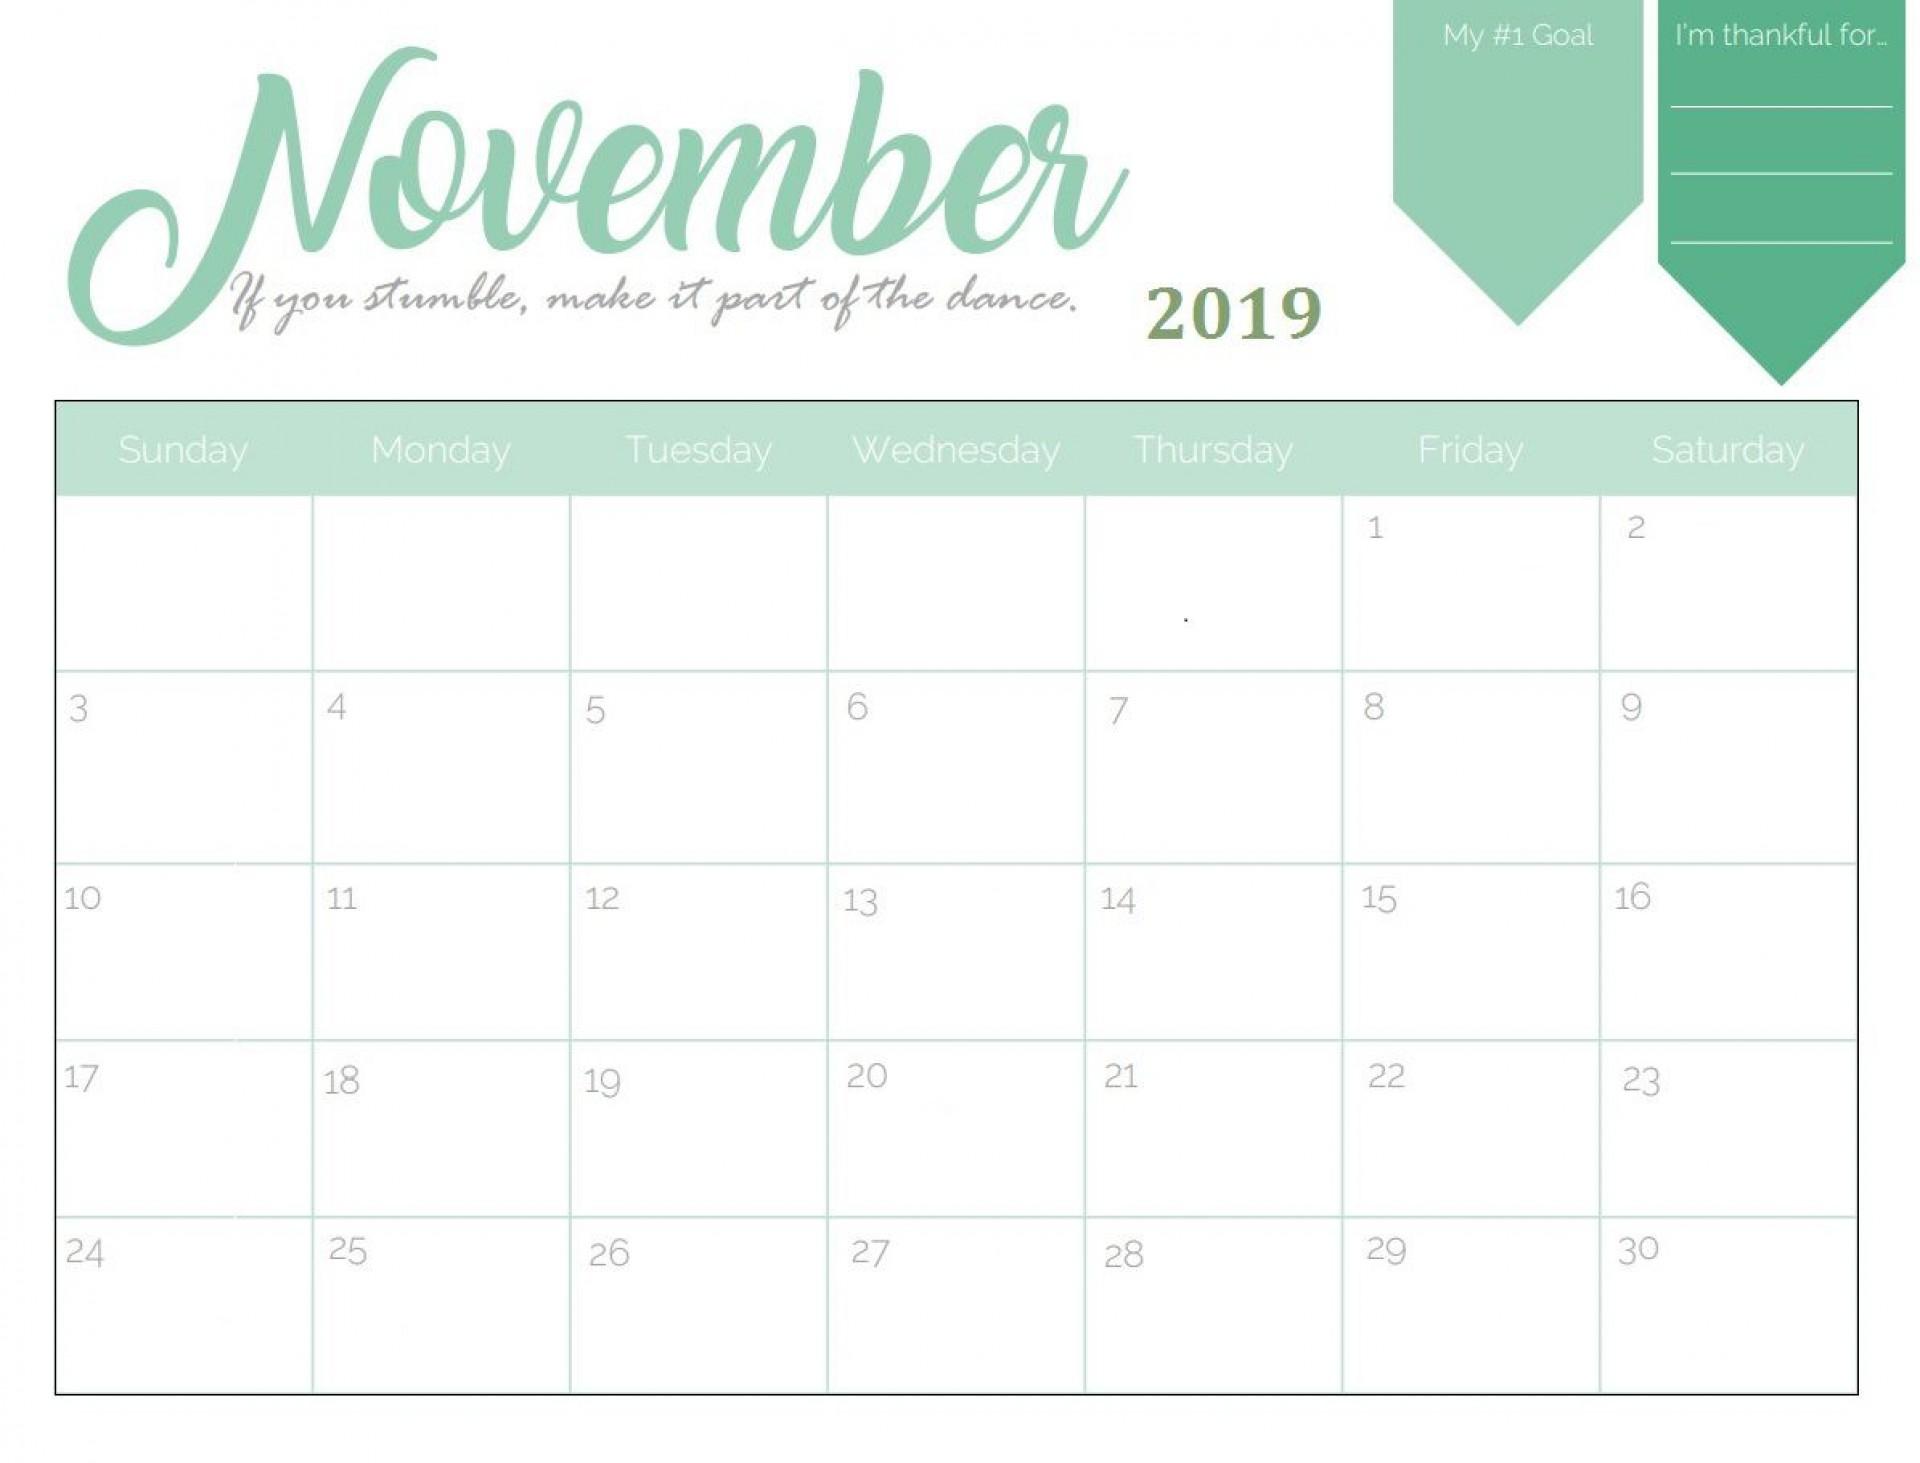 008 Imposing Calendar Template For Word 2010 High Resolution  2019 Microsoft1920